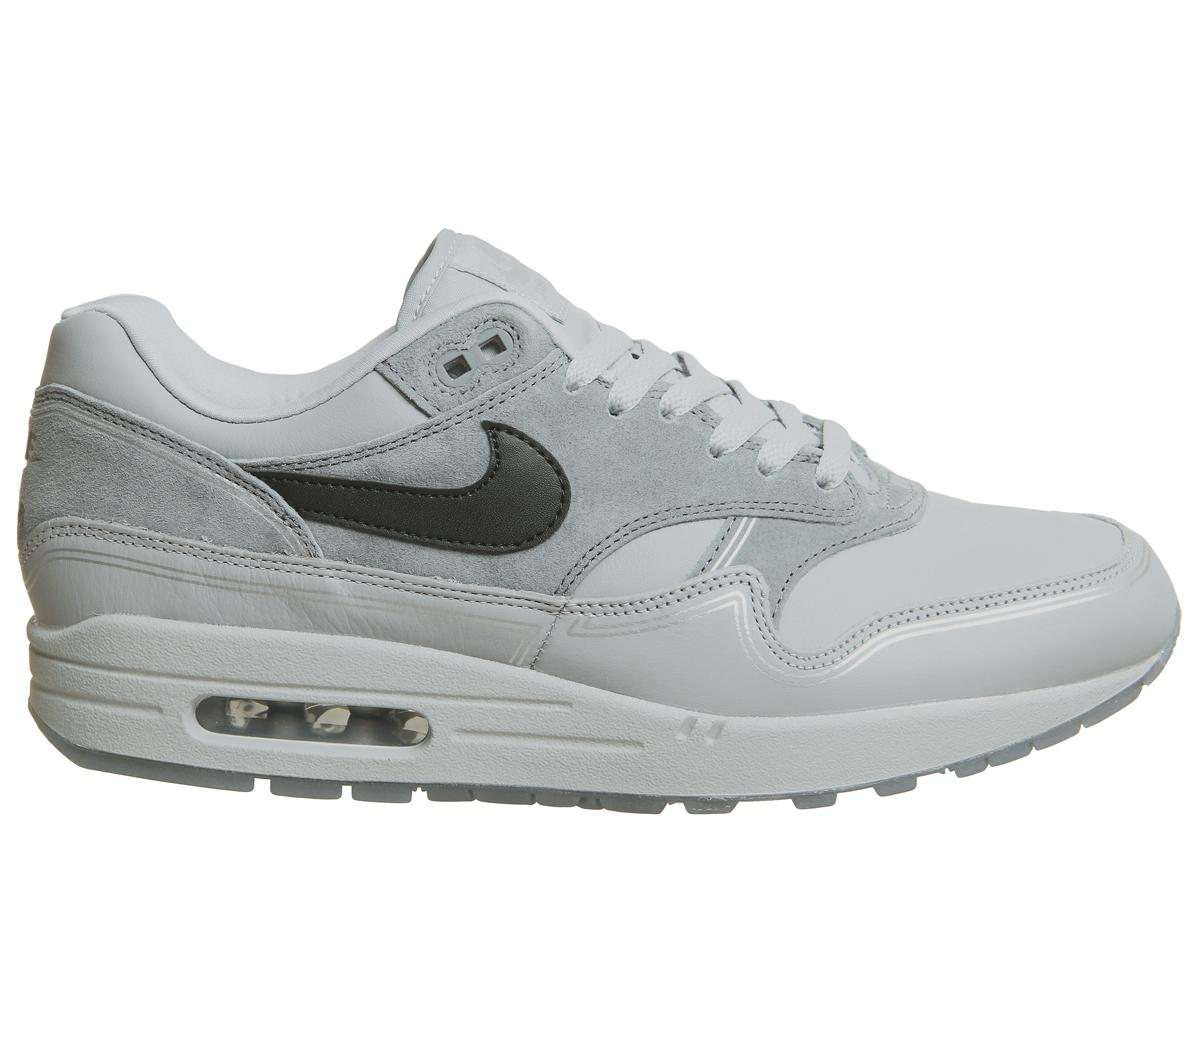 Nike Air Max Trainer 1 Cool GreyBlack Wolf Grey